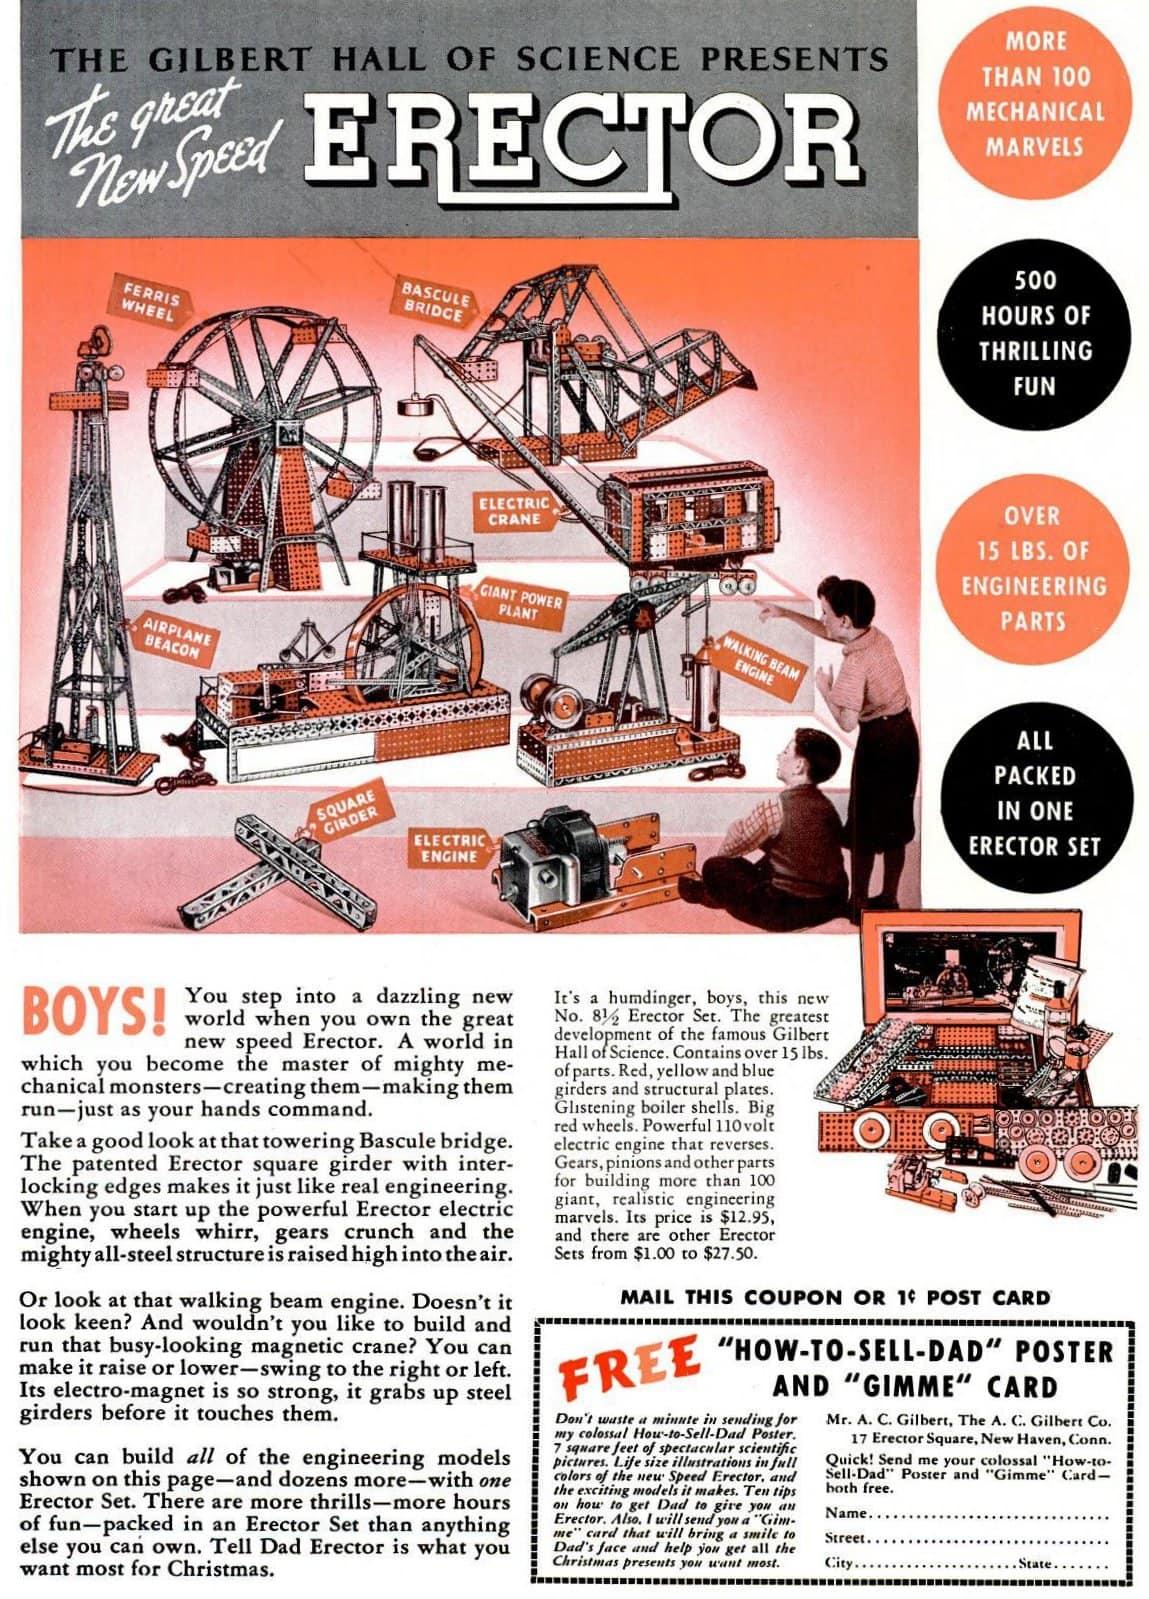 1937 Erector set